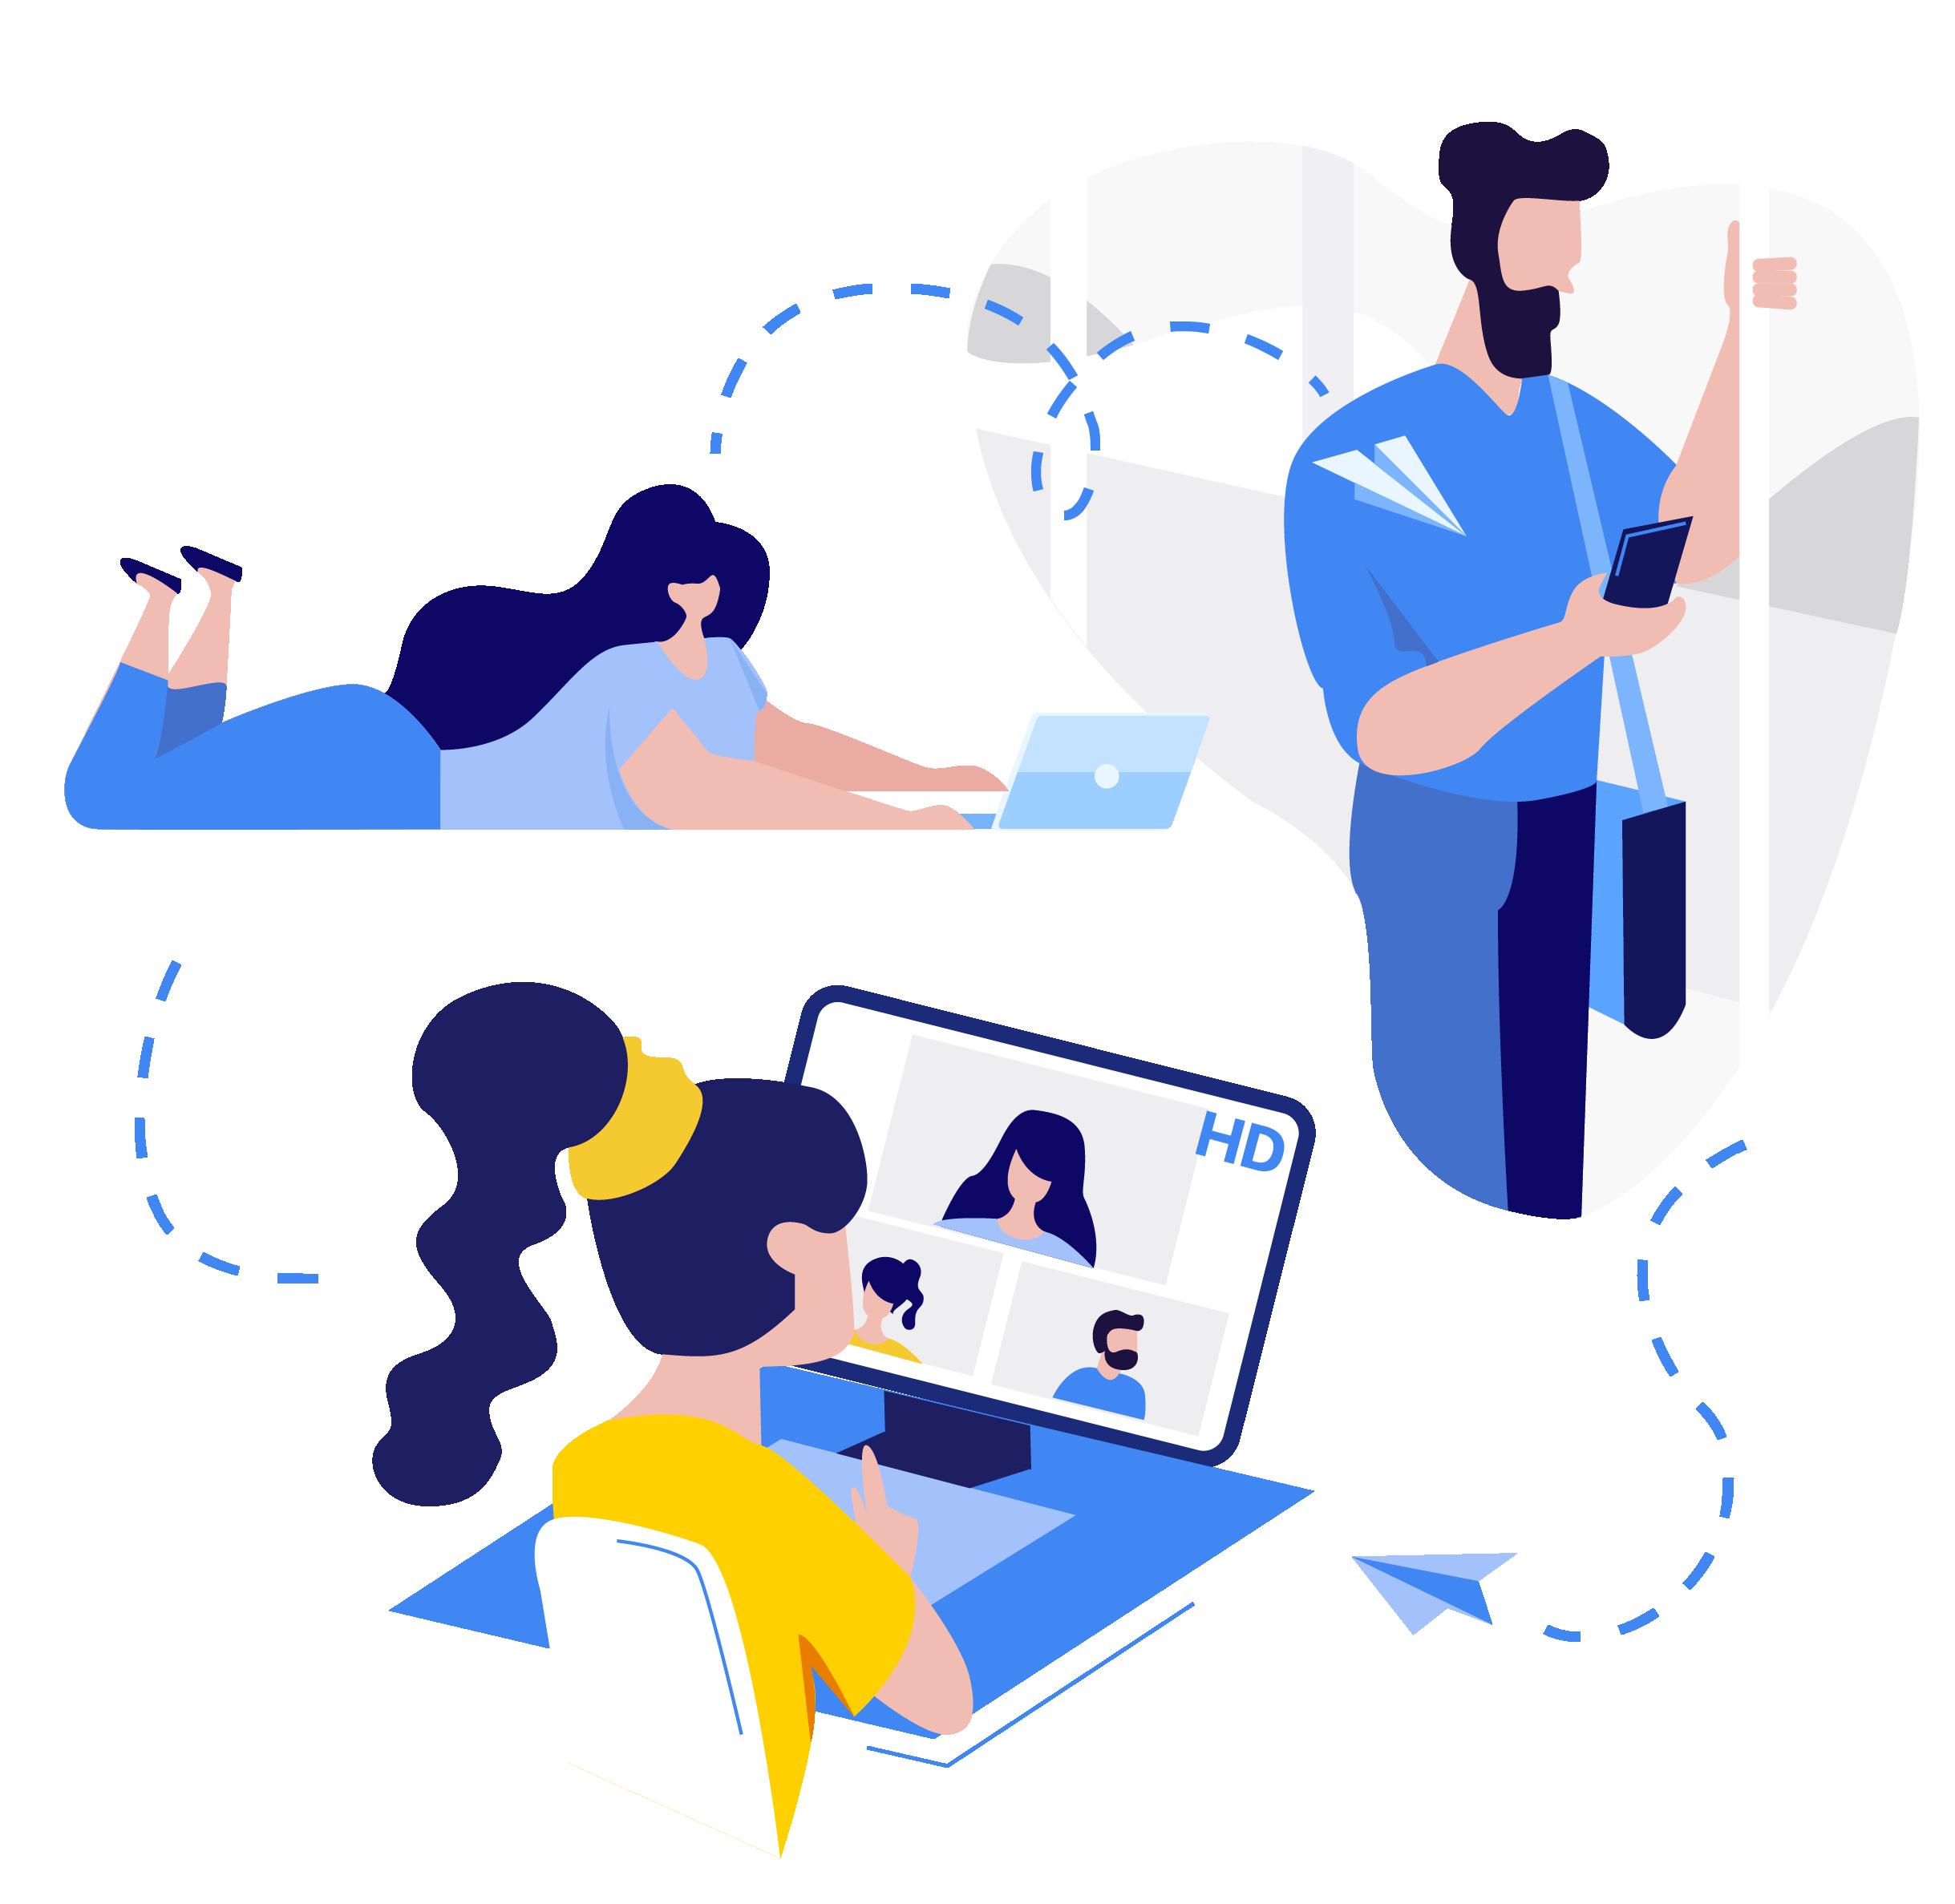 TeamLink - Free Video Conferencing & Web Conferencing